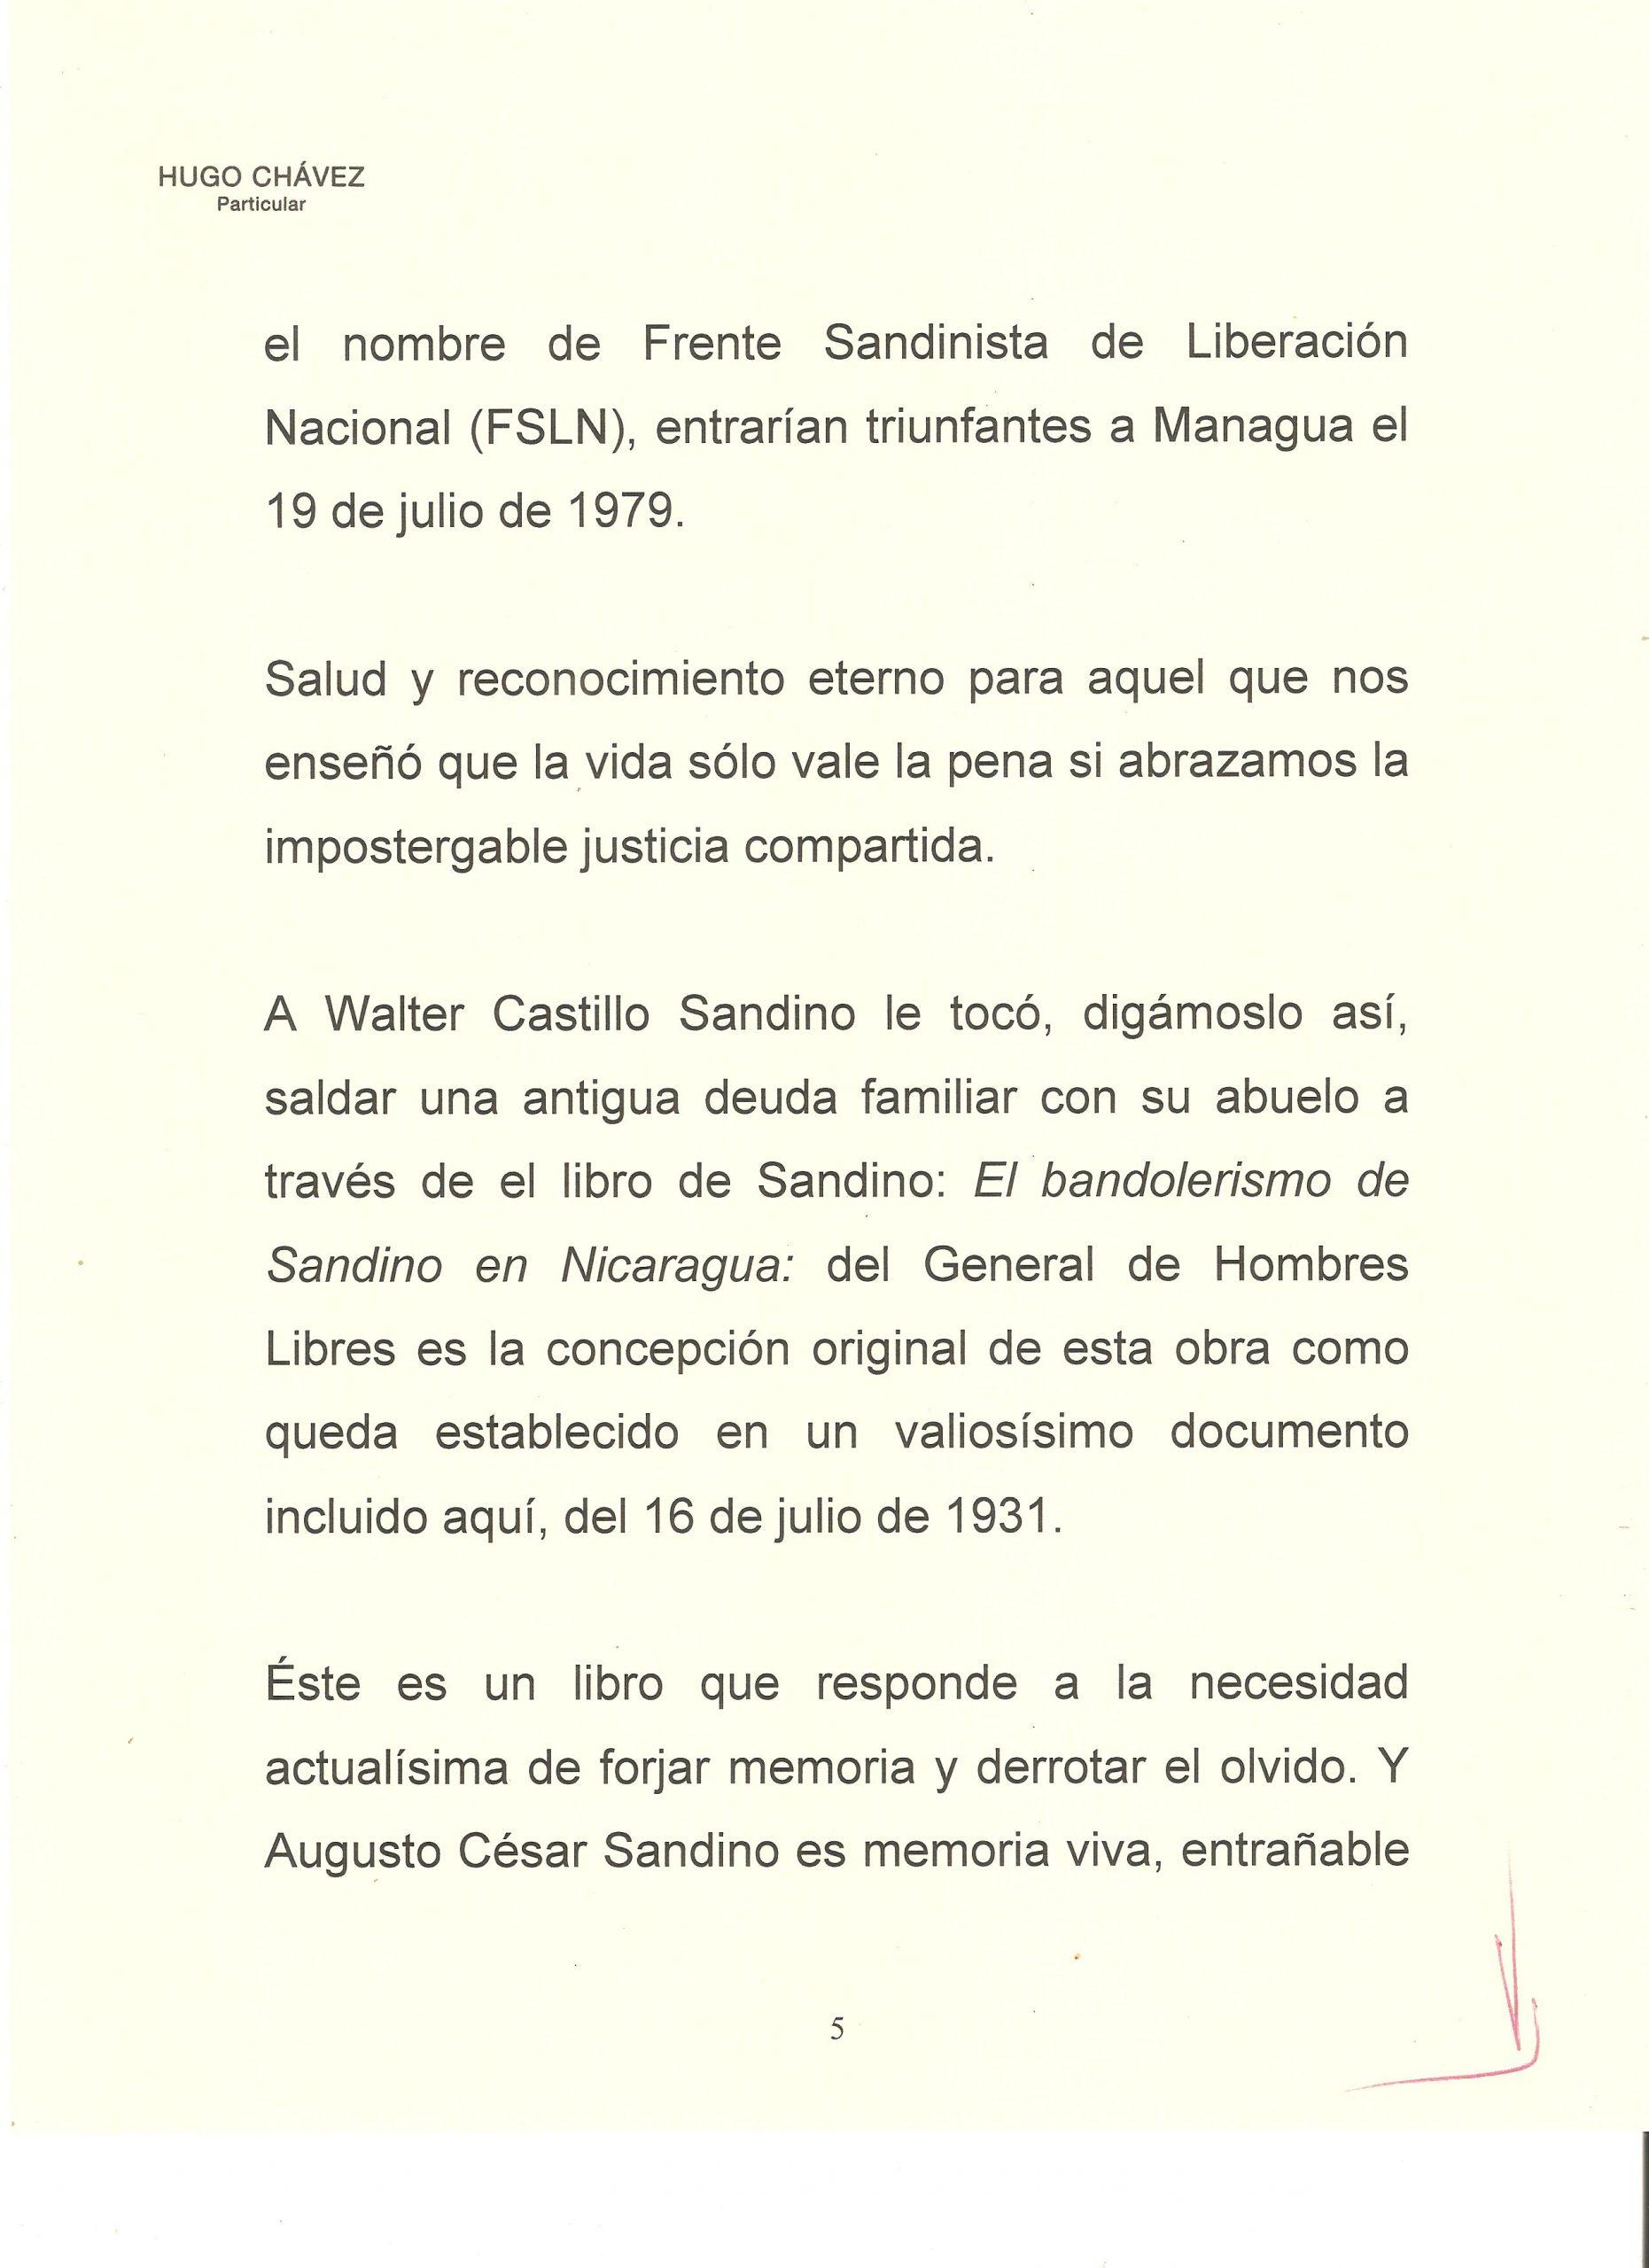 PROLOGO DE HUGO CHAVEZ A WALTER 5